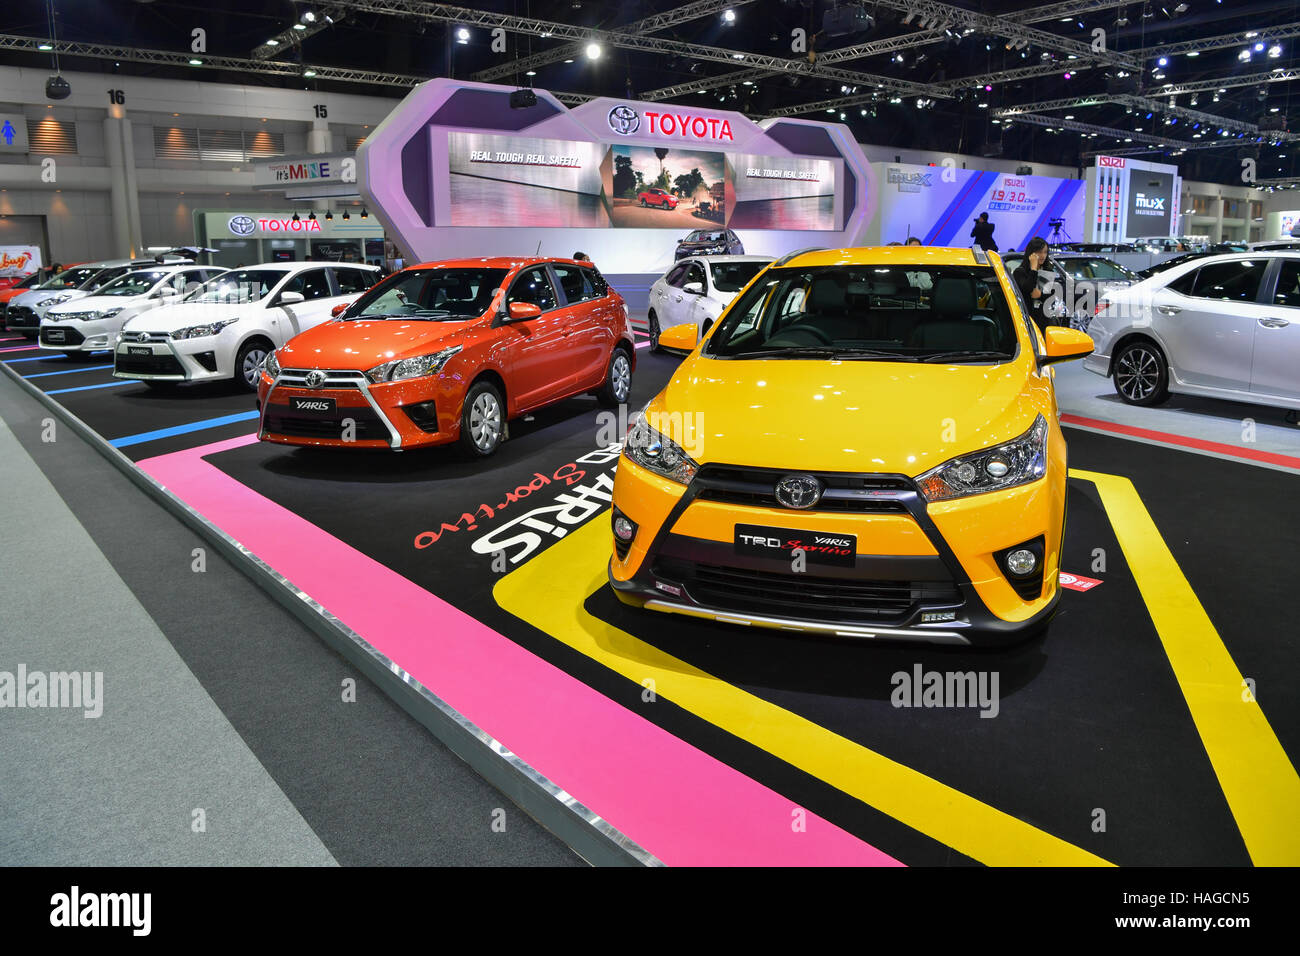 all new yaris trd sportivo 2017 kijang innova 2.0 q a/t venturer car stock photos images page 2 alamy nonthaburi thailand 30th november 2016 30 toyota